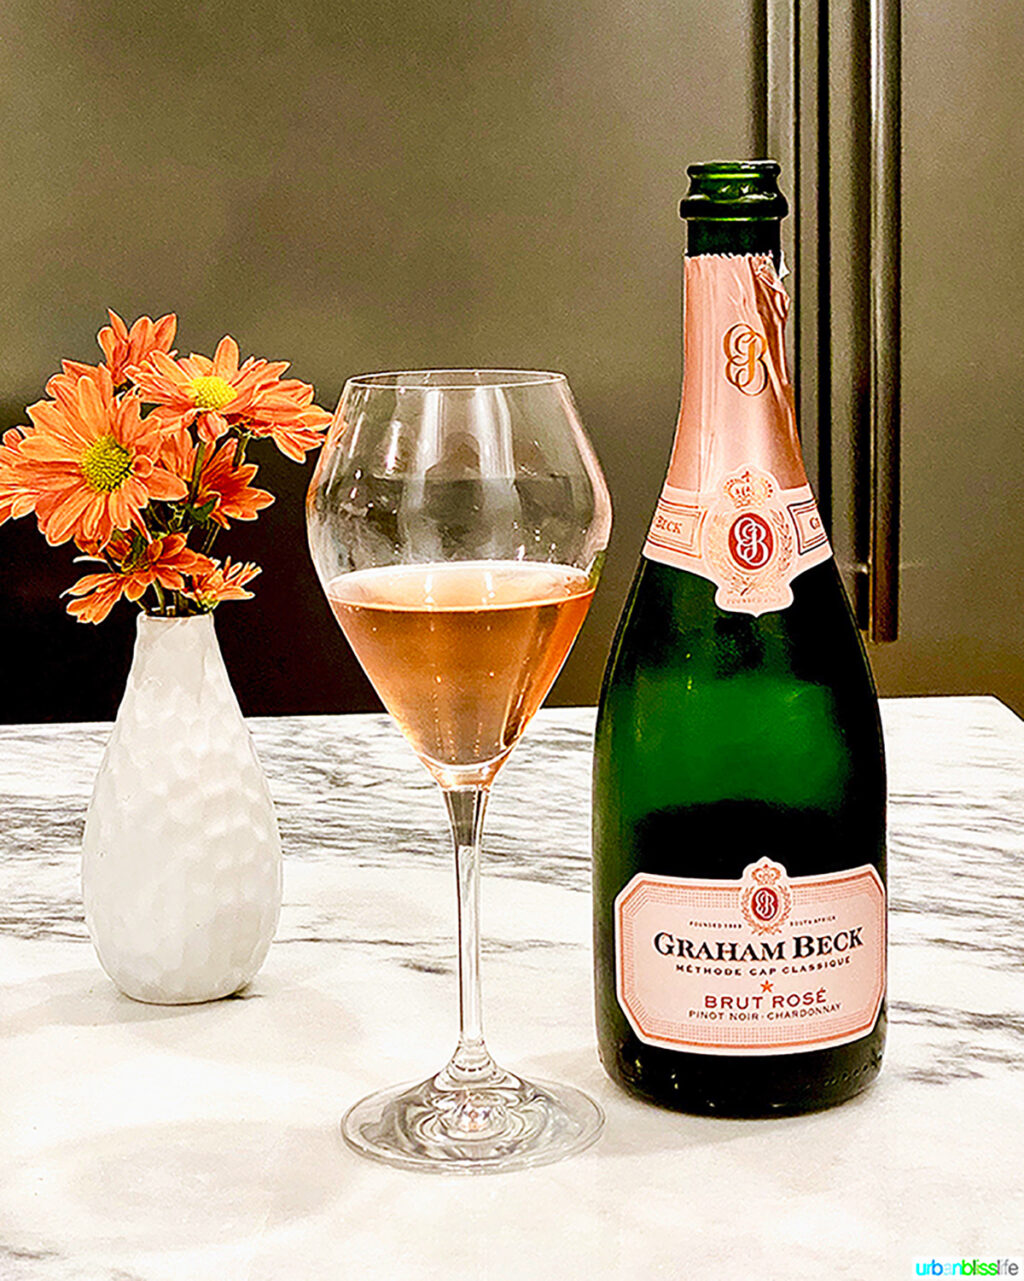 graham beck brut rose bottle, glass, and flowers